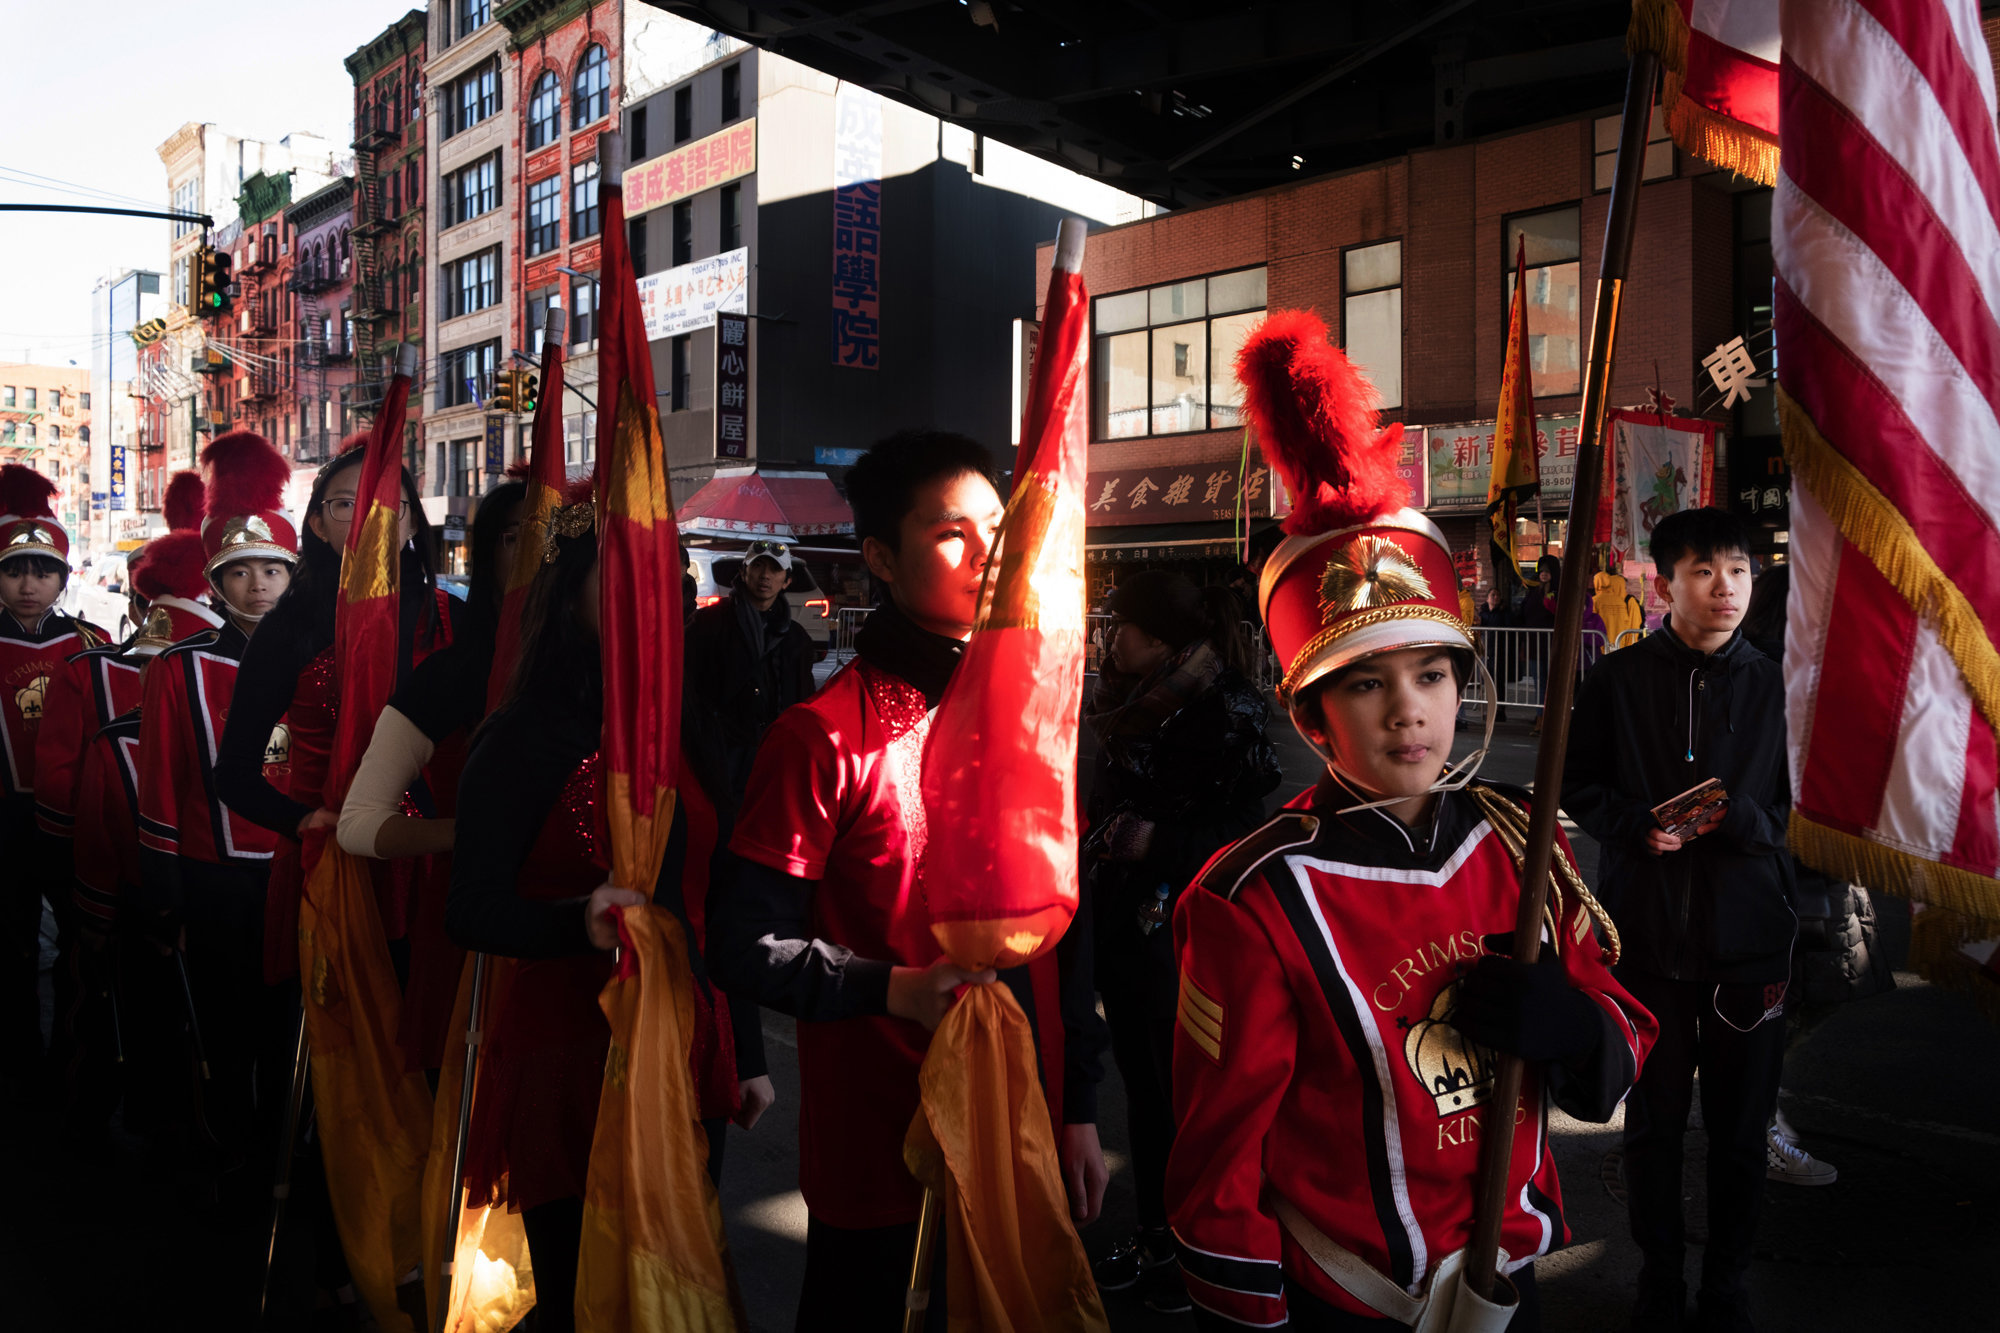 Chinatown, New York. Lunar year 2019